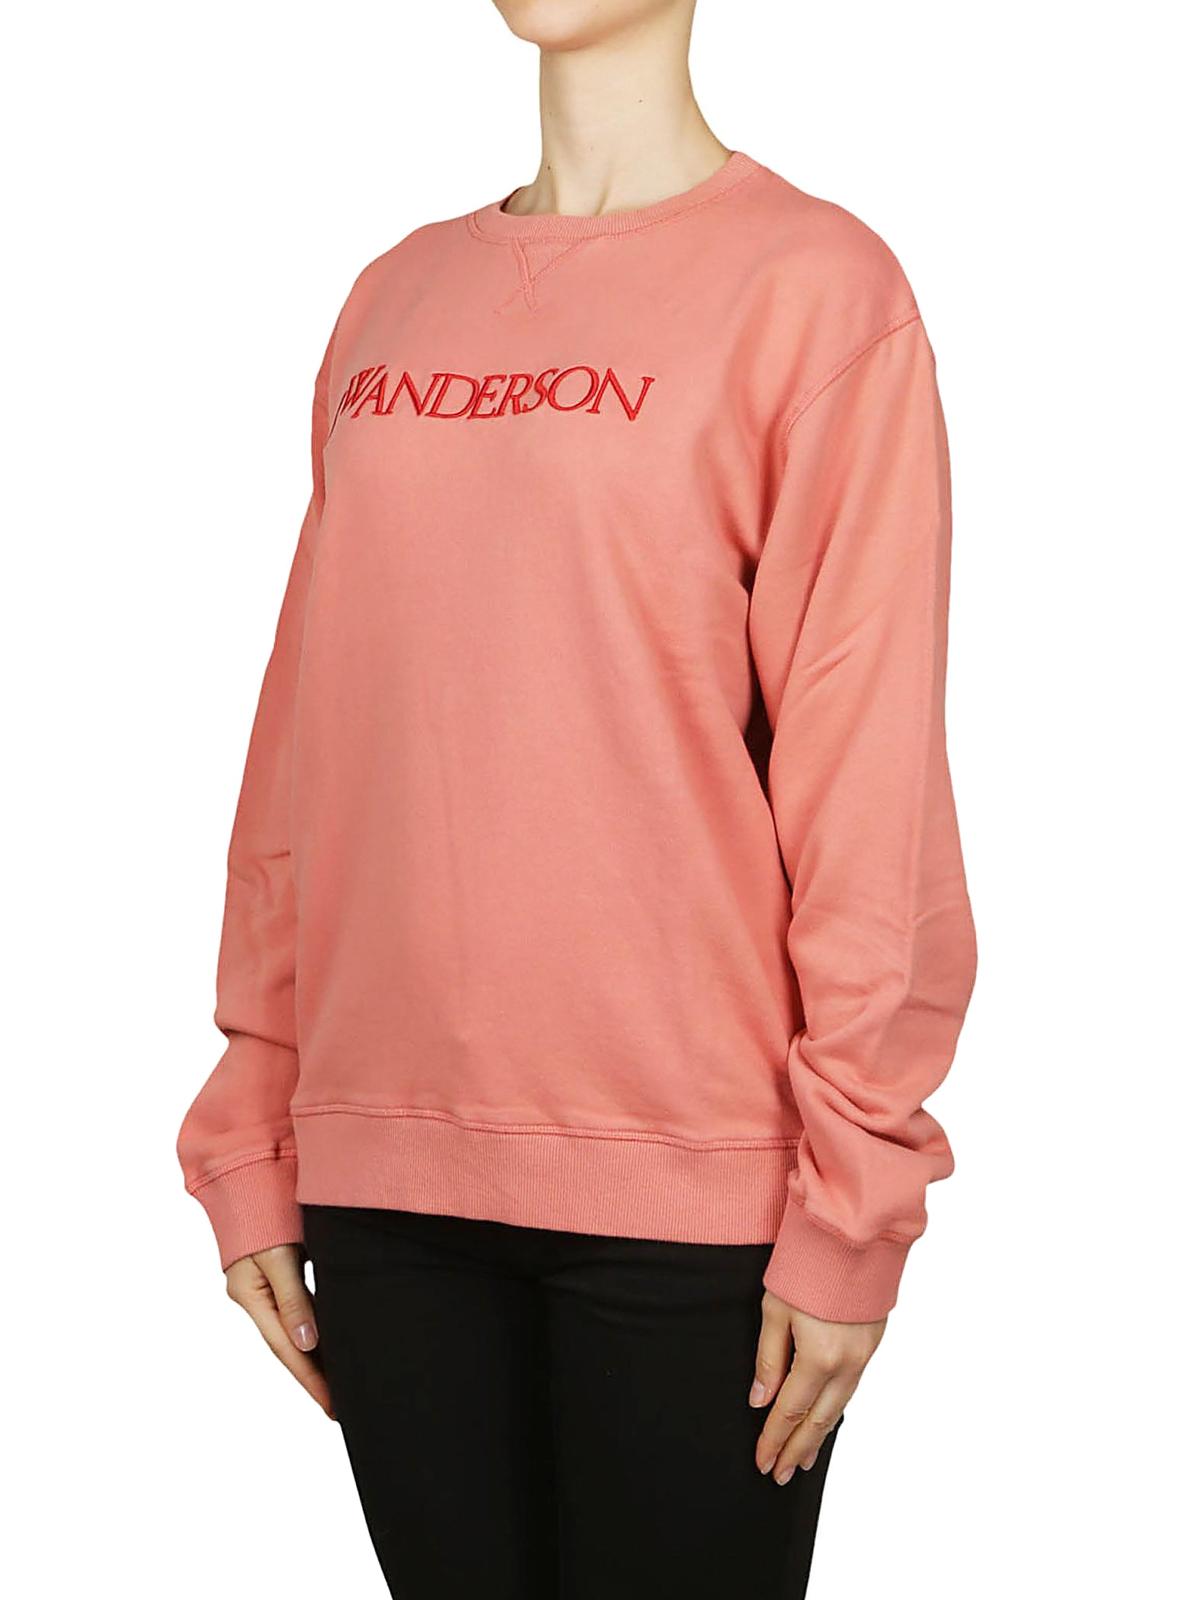 Sweatshirts J w Rose Online Sweat Shirts amp; Anderson Pulls wWFxCEWqf4